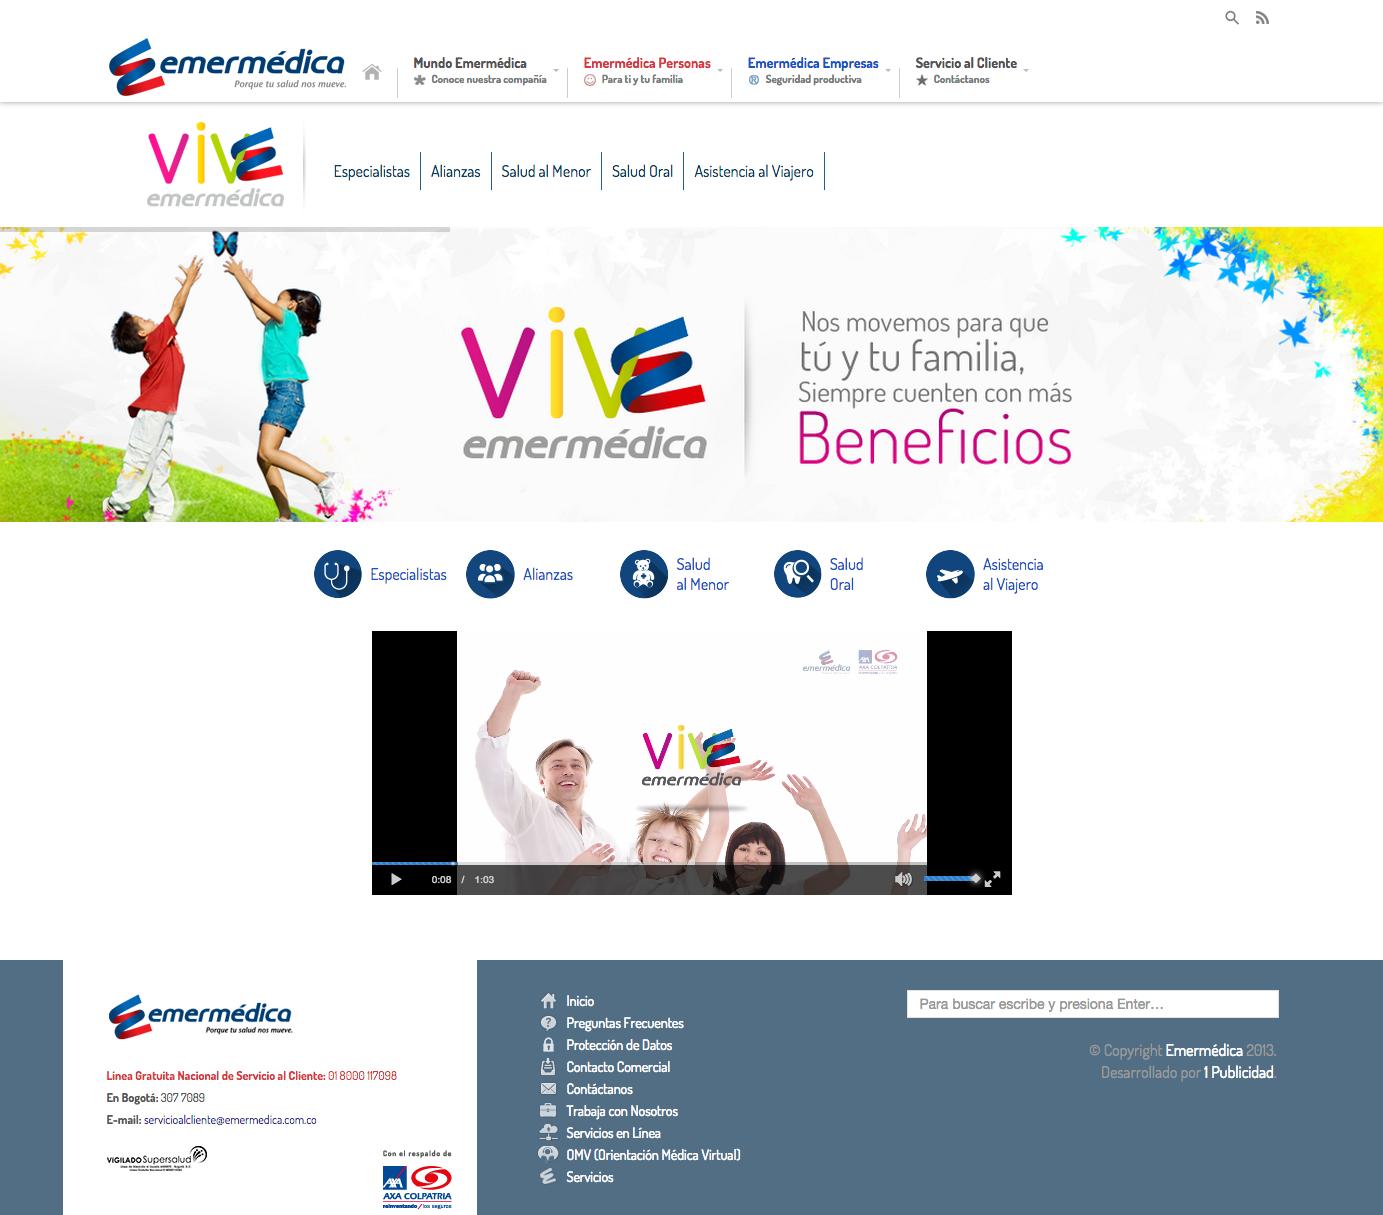 vive_emermedica_web1